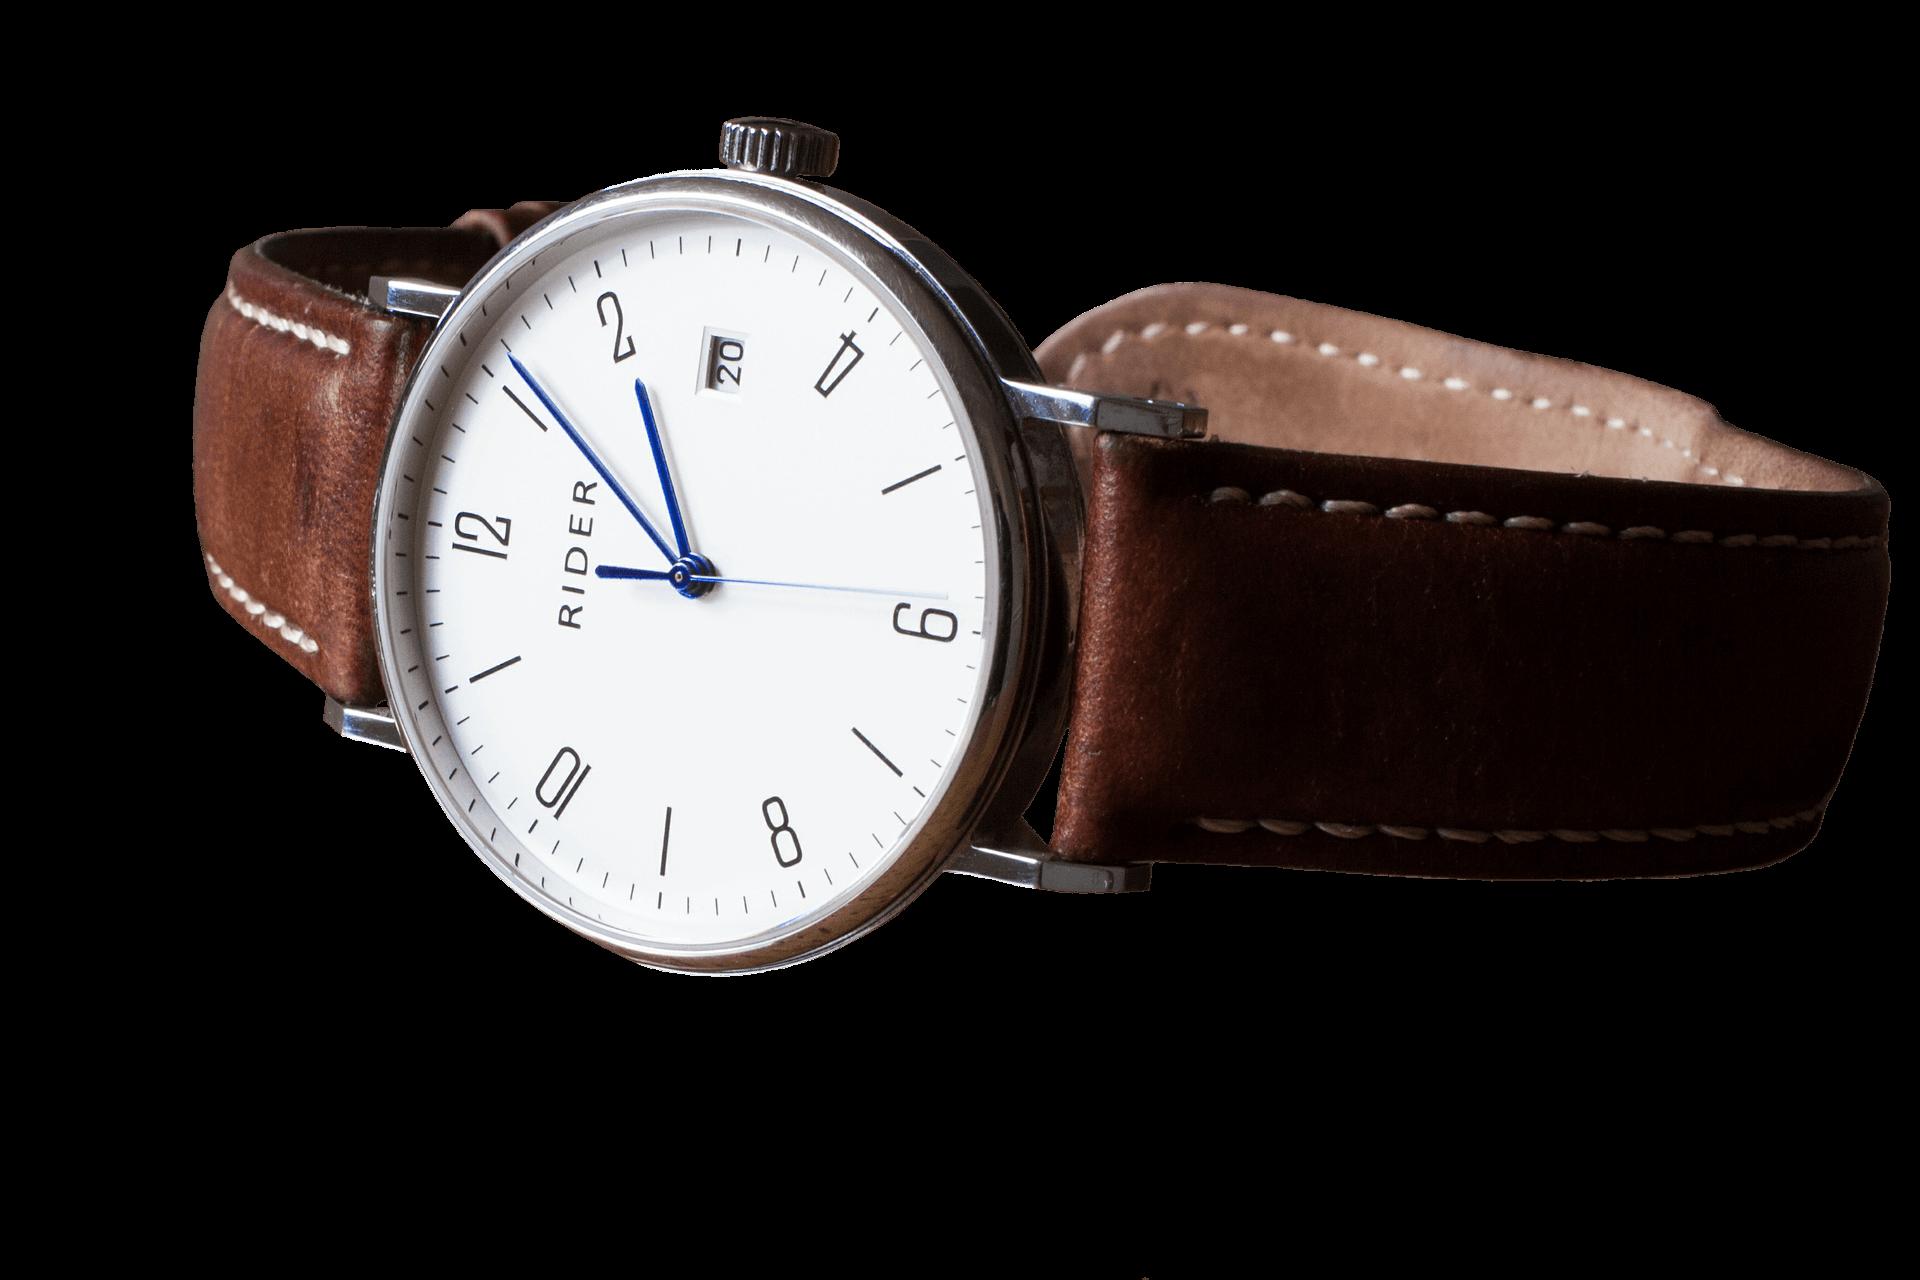 Co mówi o Tobie pasek od zegarka?